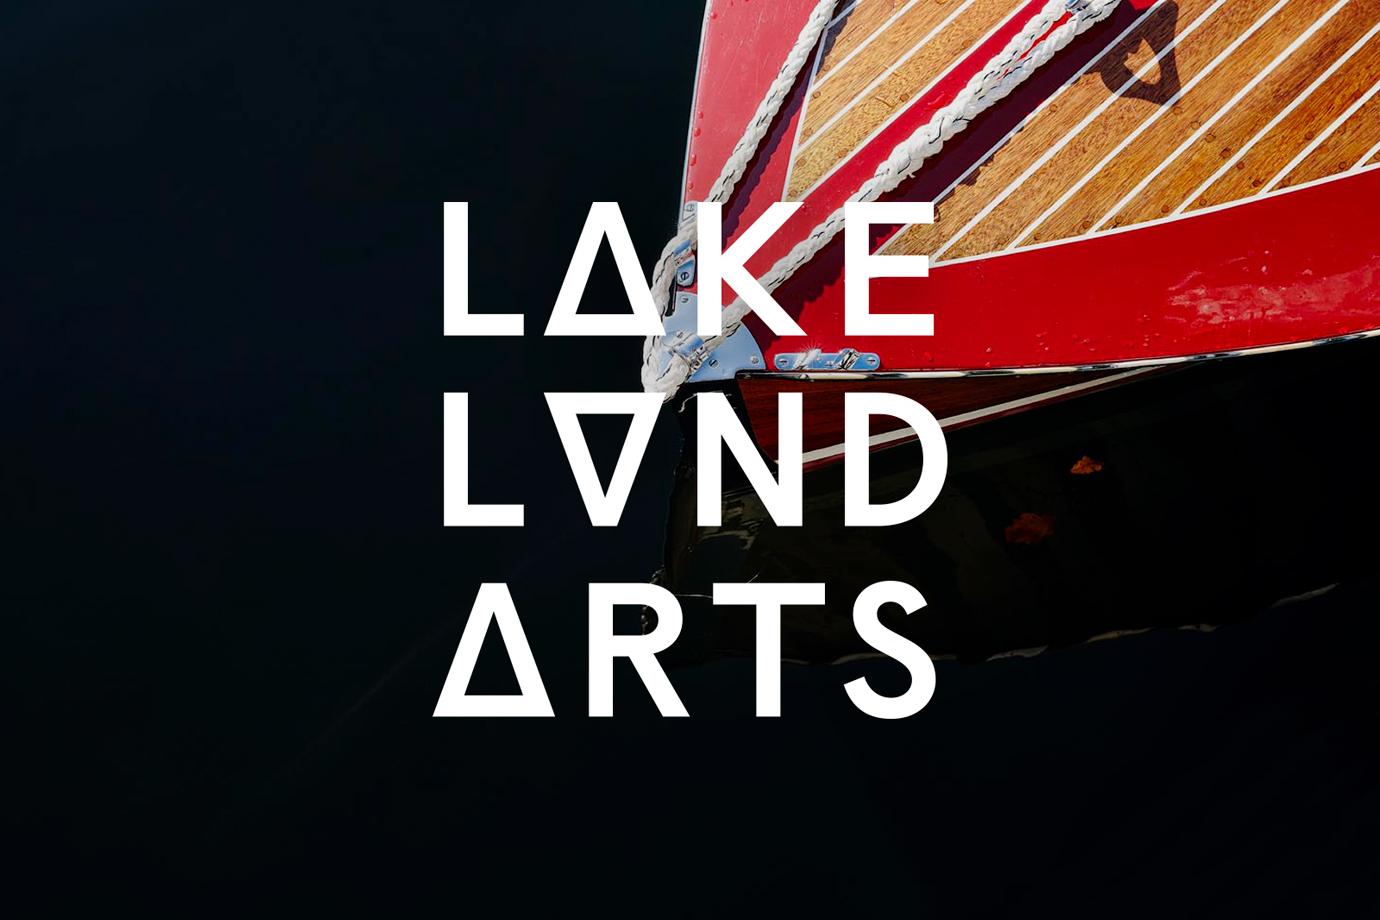 https://spystudio.co.uk/wp-content/uploads/2021/03/Lakeland_Arts_logo_journal-1380x920.jpg